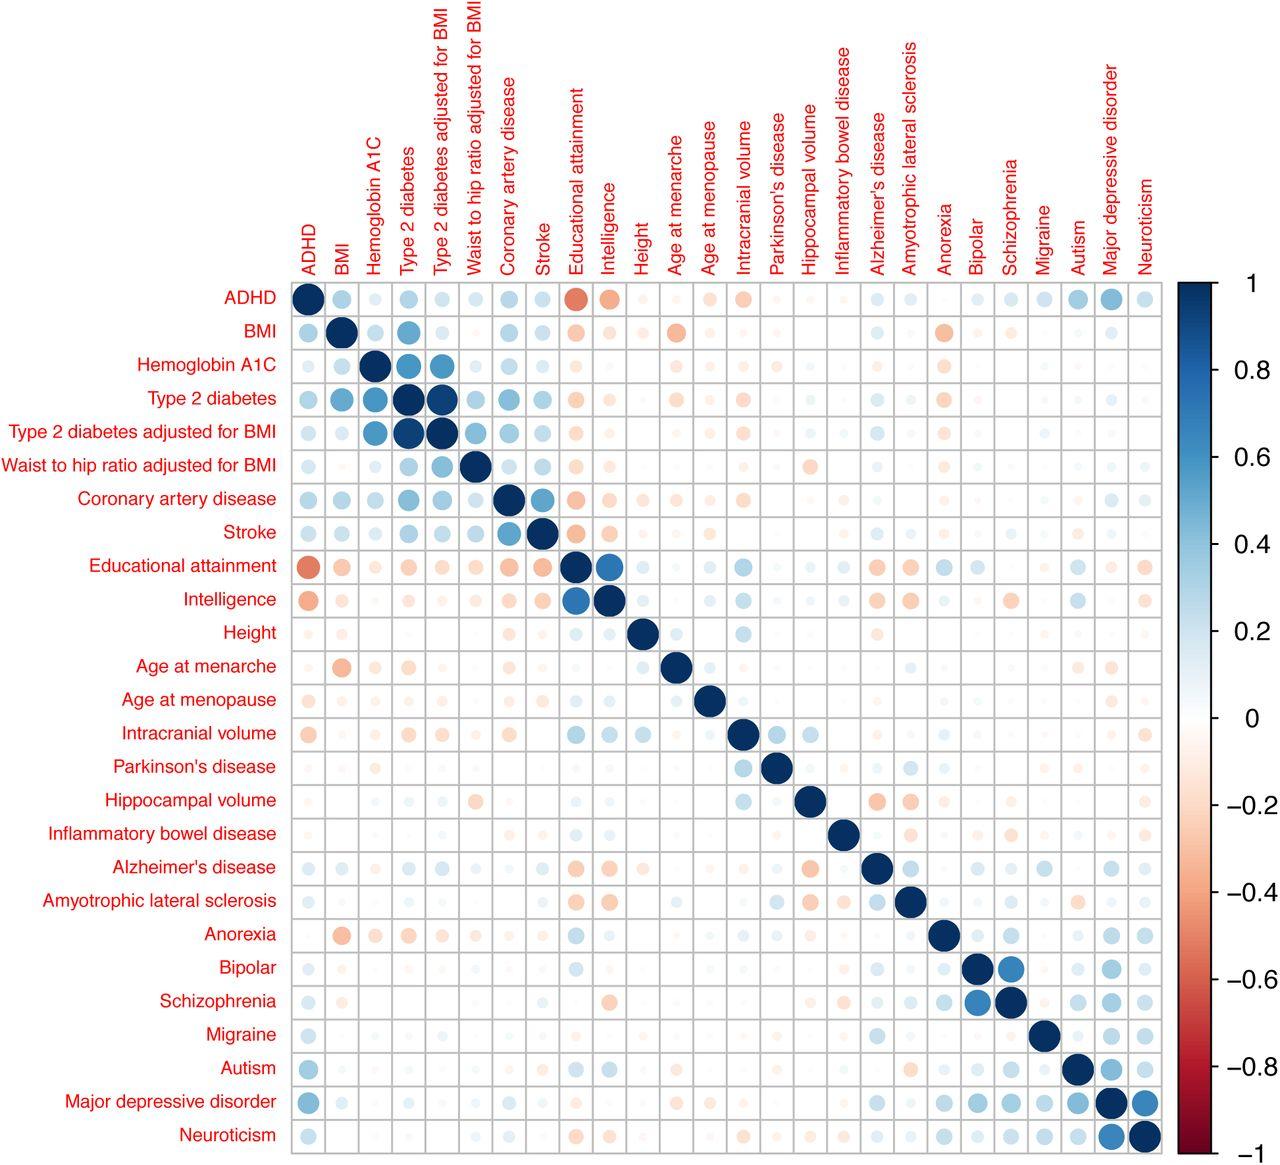 Genetic Identification of Cell Types Underlying Brain